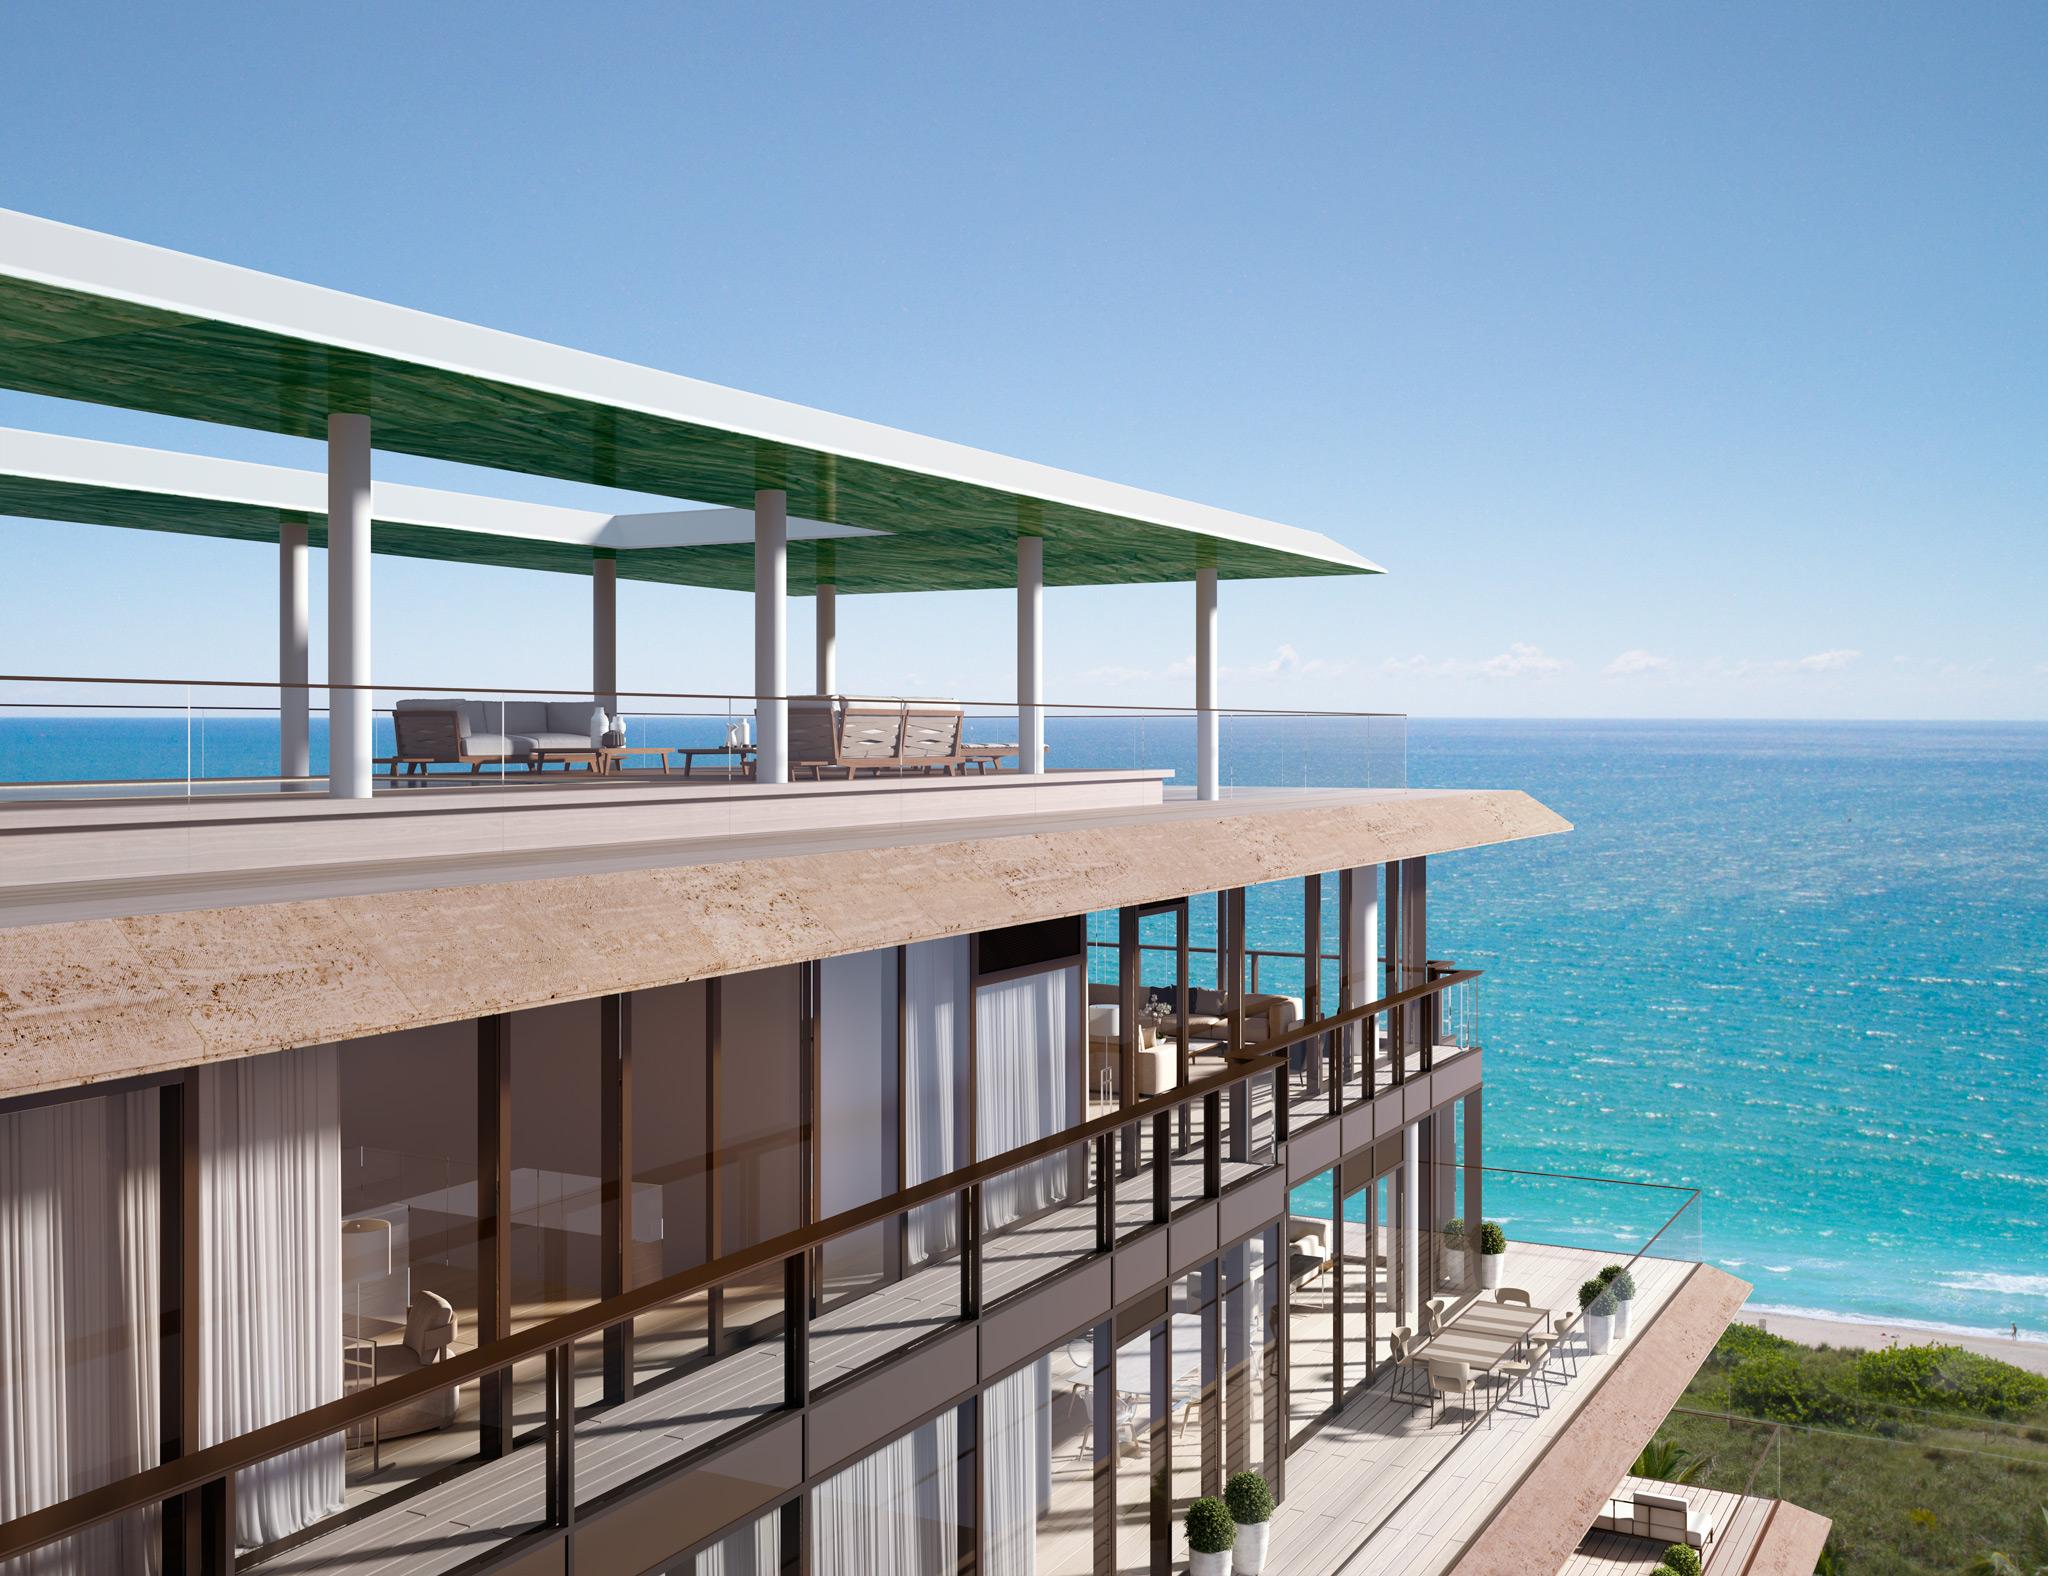 Arte By Antonio Citterio Launches Sales In Miami's Exclusive Surfside Neighborhood